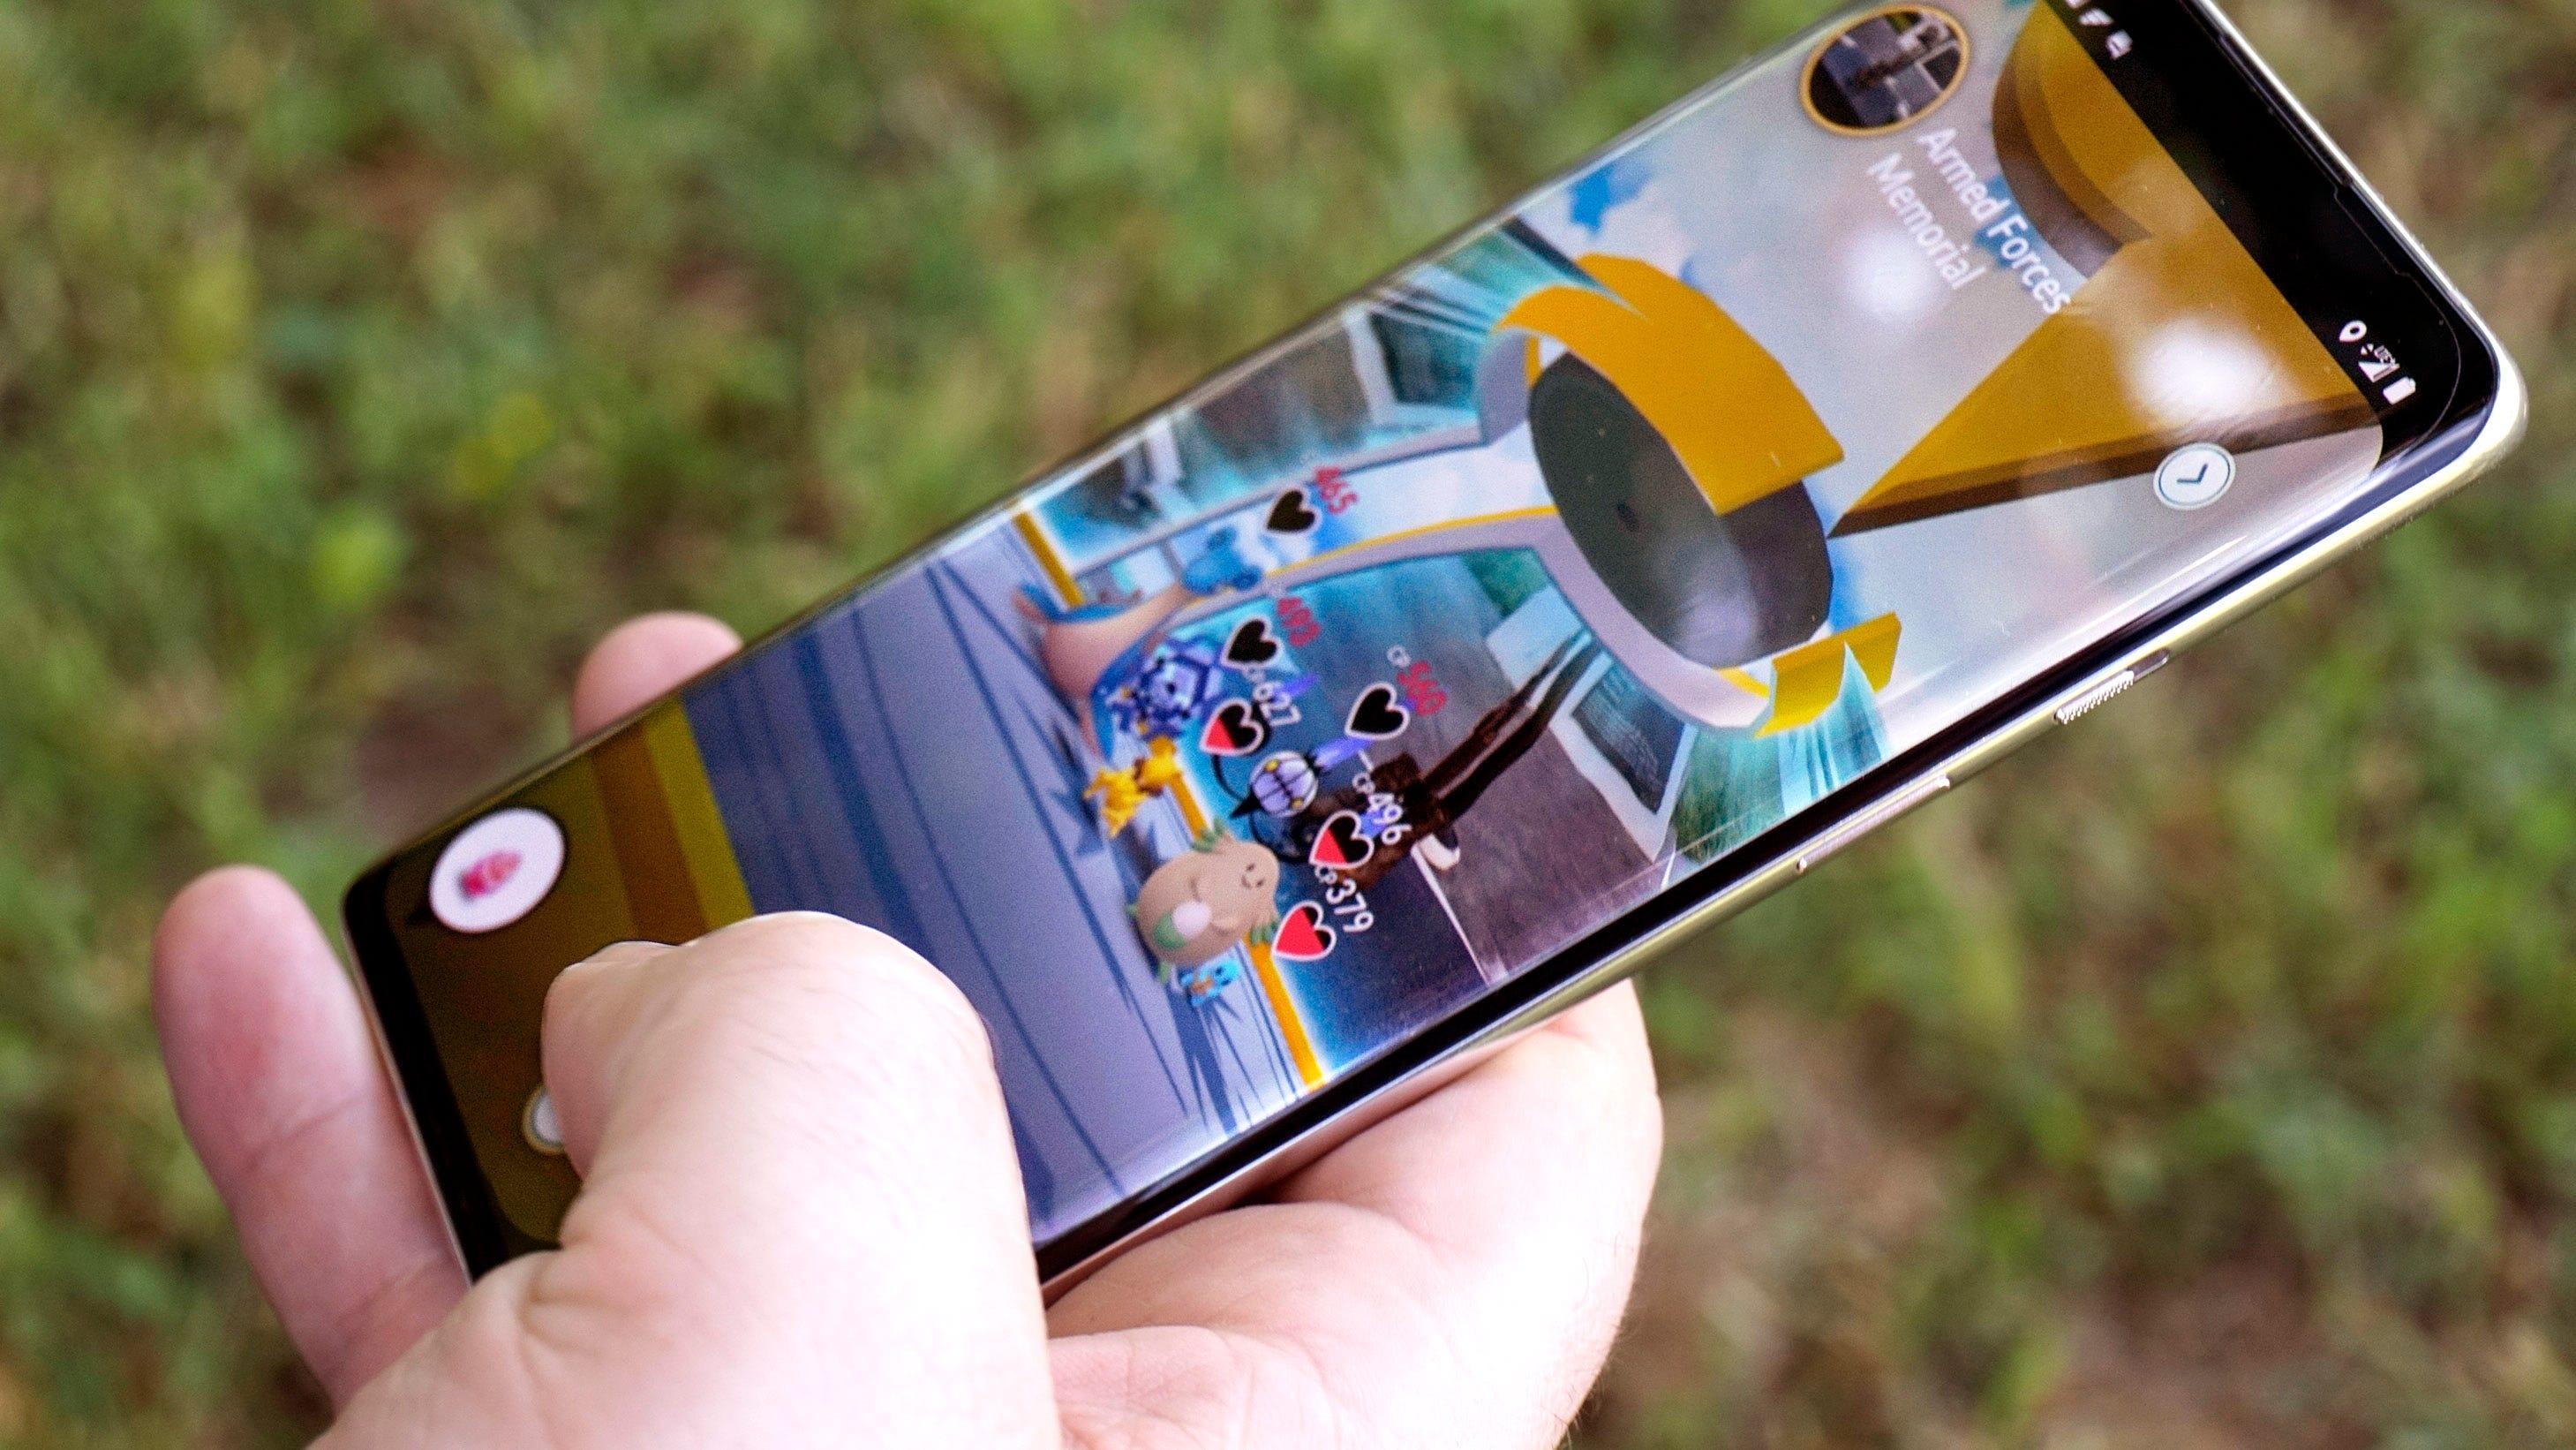 OnePlus 8 playing Pokemon Go